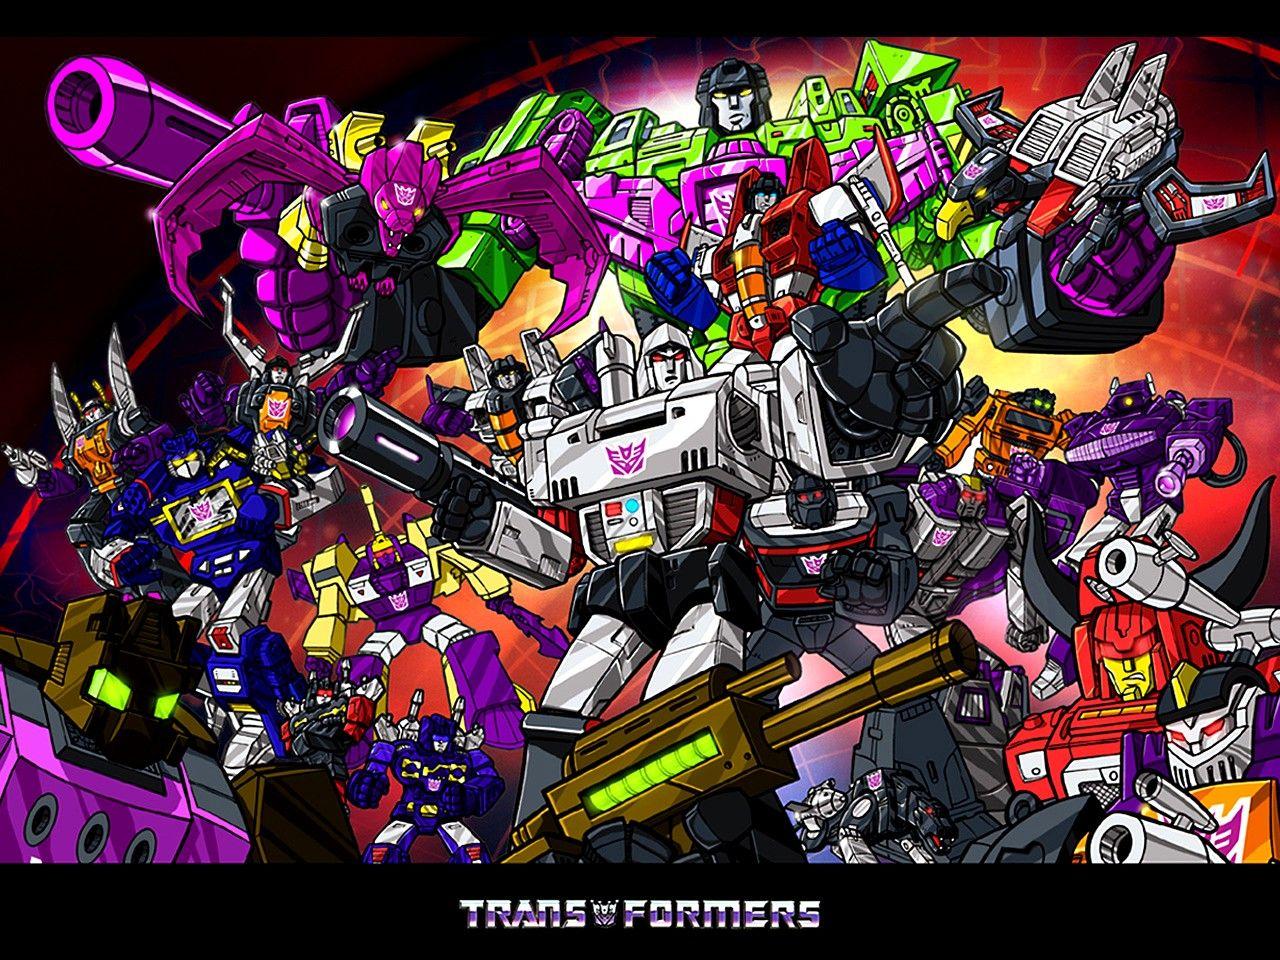 Transformers G1 Wallpapers Transformers Decepticons Transformers Art